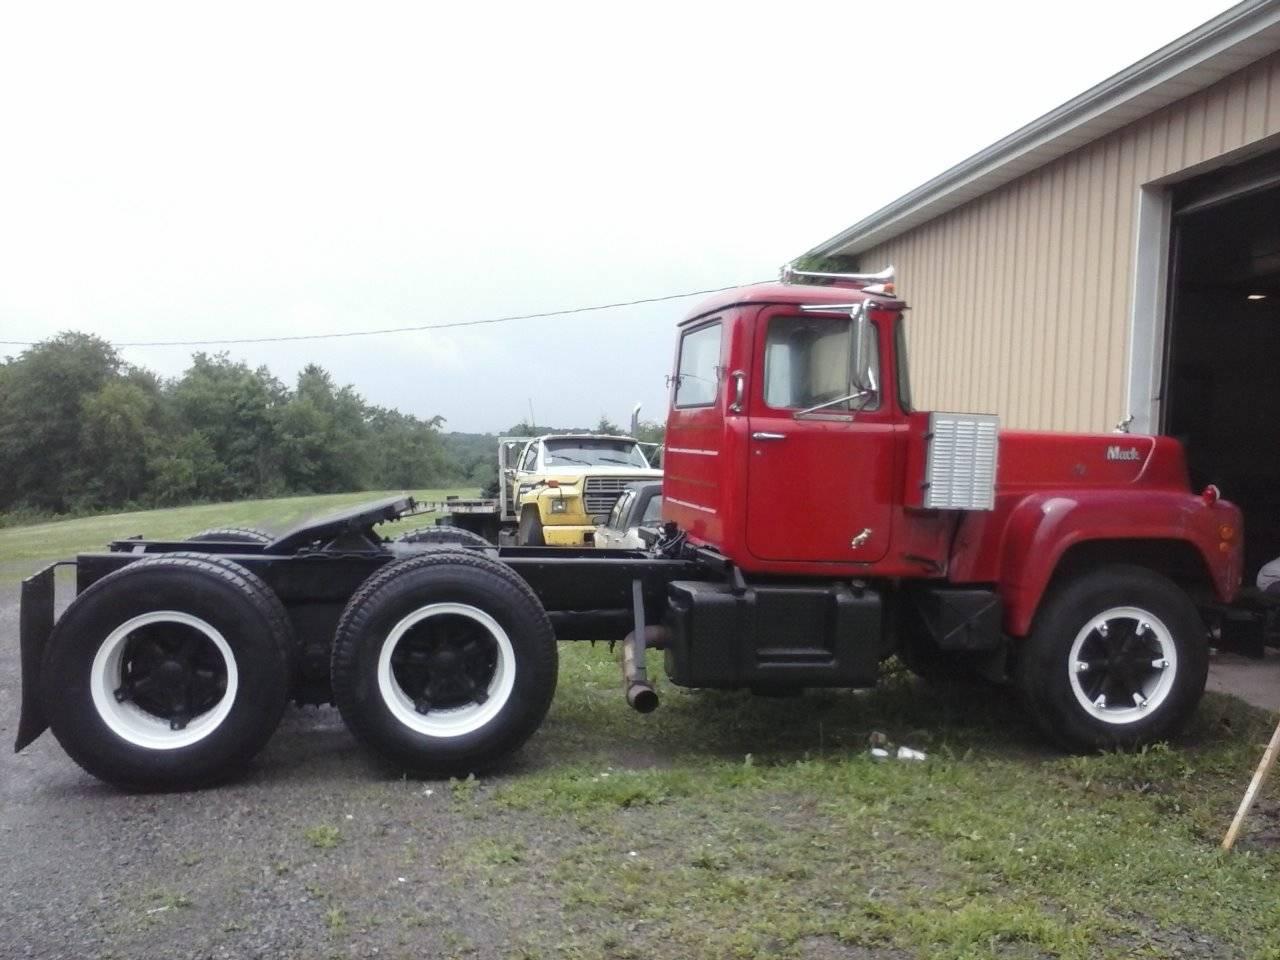 Trucks For Sale In Va >> 1972 Mack R700 V8, Ohio - Trucks for Sale - BigMackTrucks.com